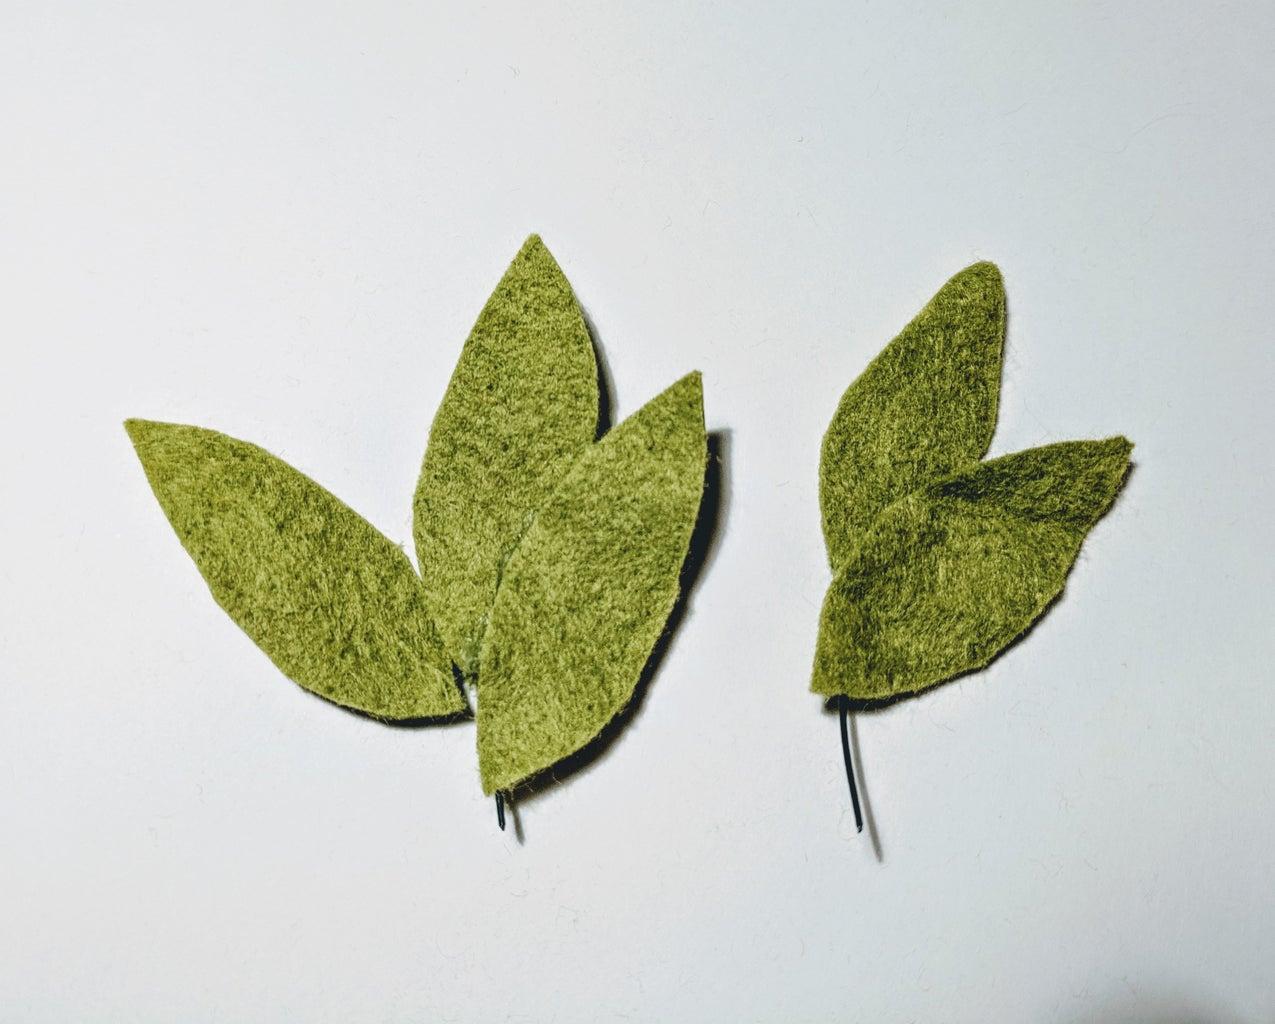 A Different Type of Leaf Arrangement